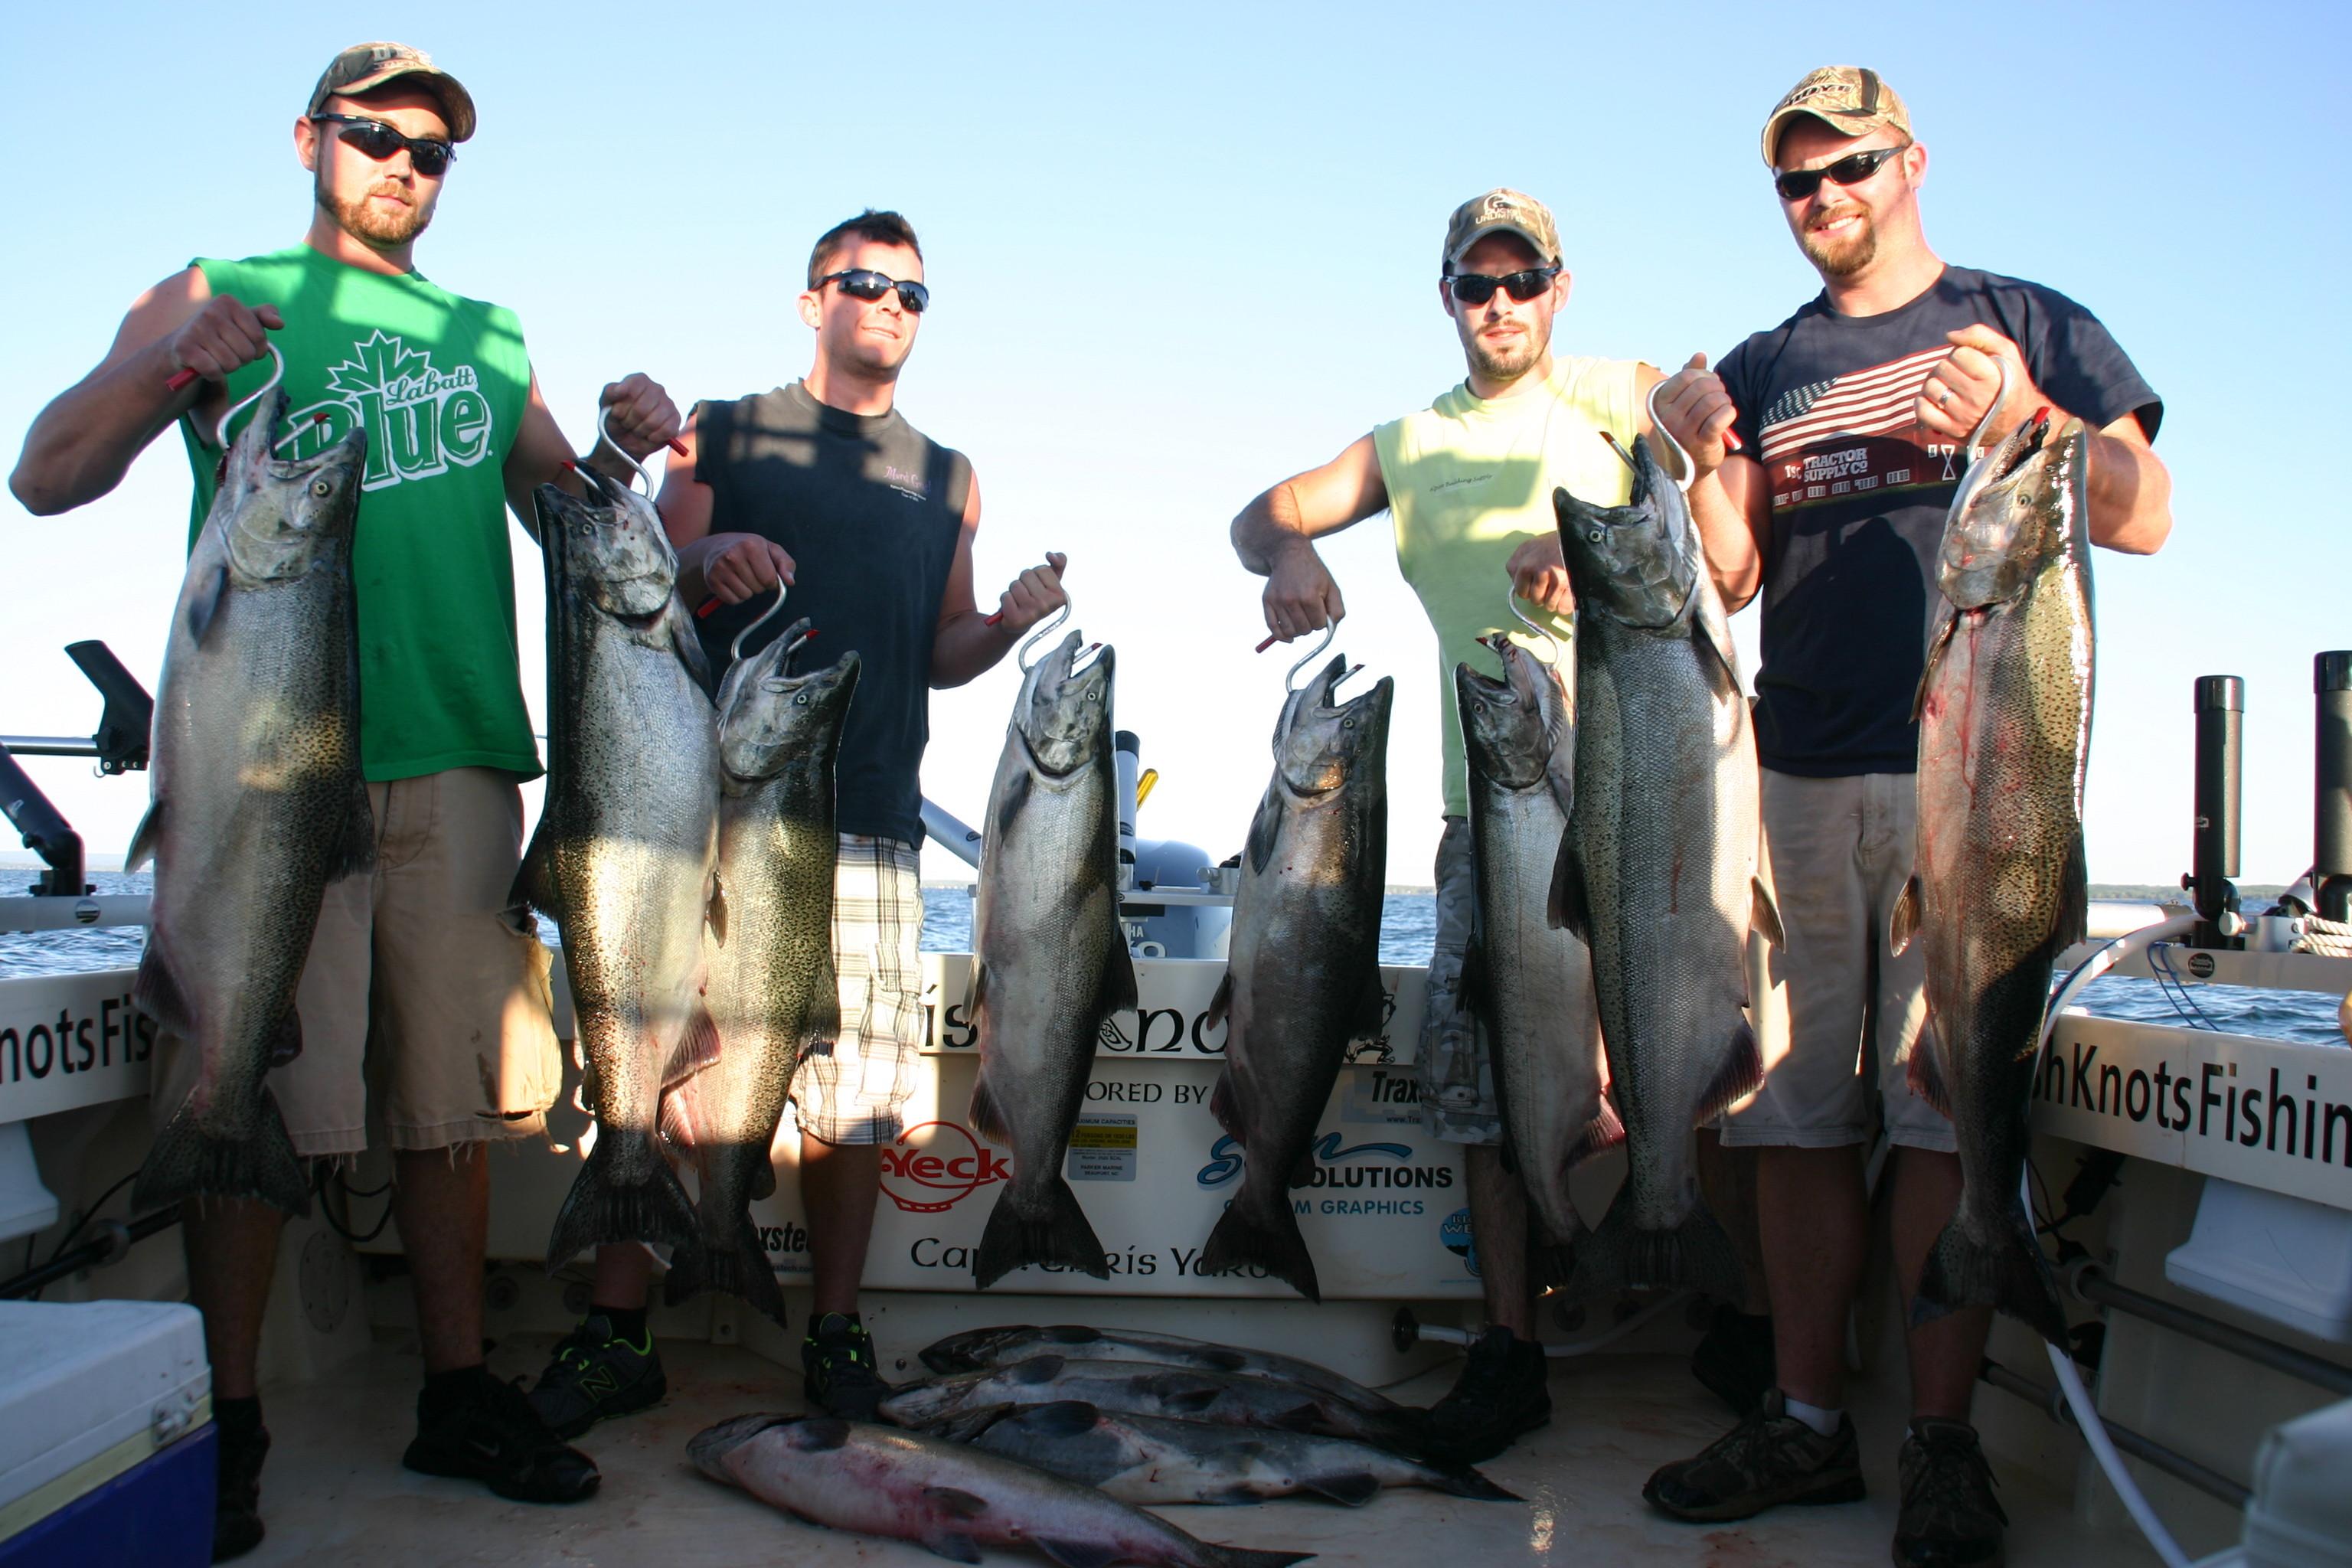 Irish Knots Sport Fishing: Irish Knots Lake Ontario Charter